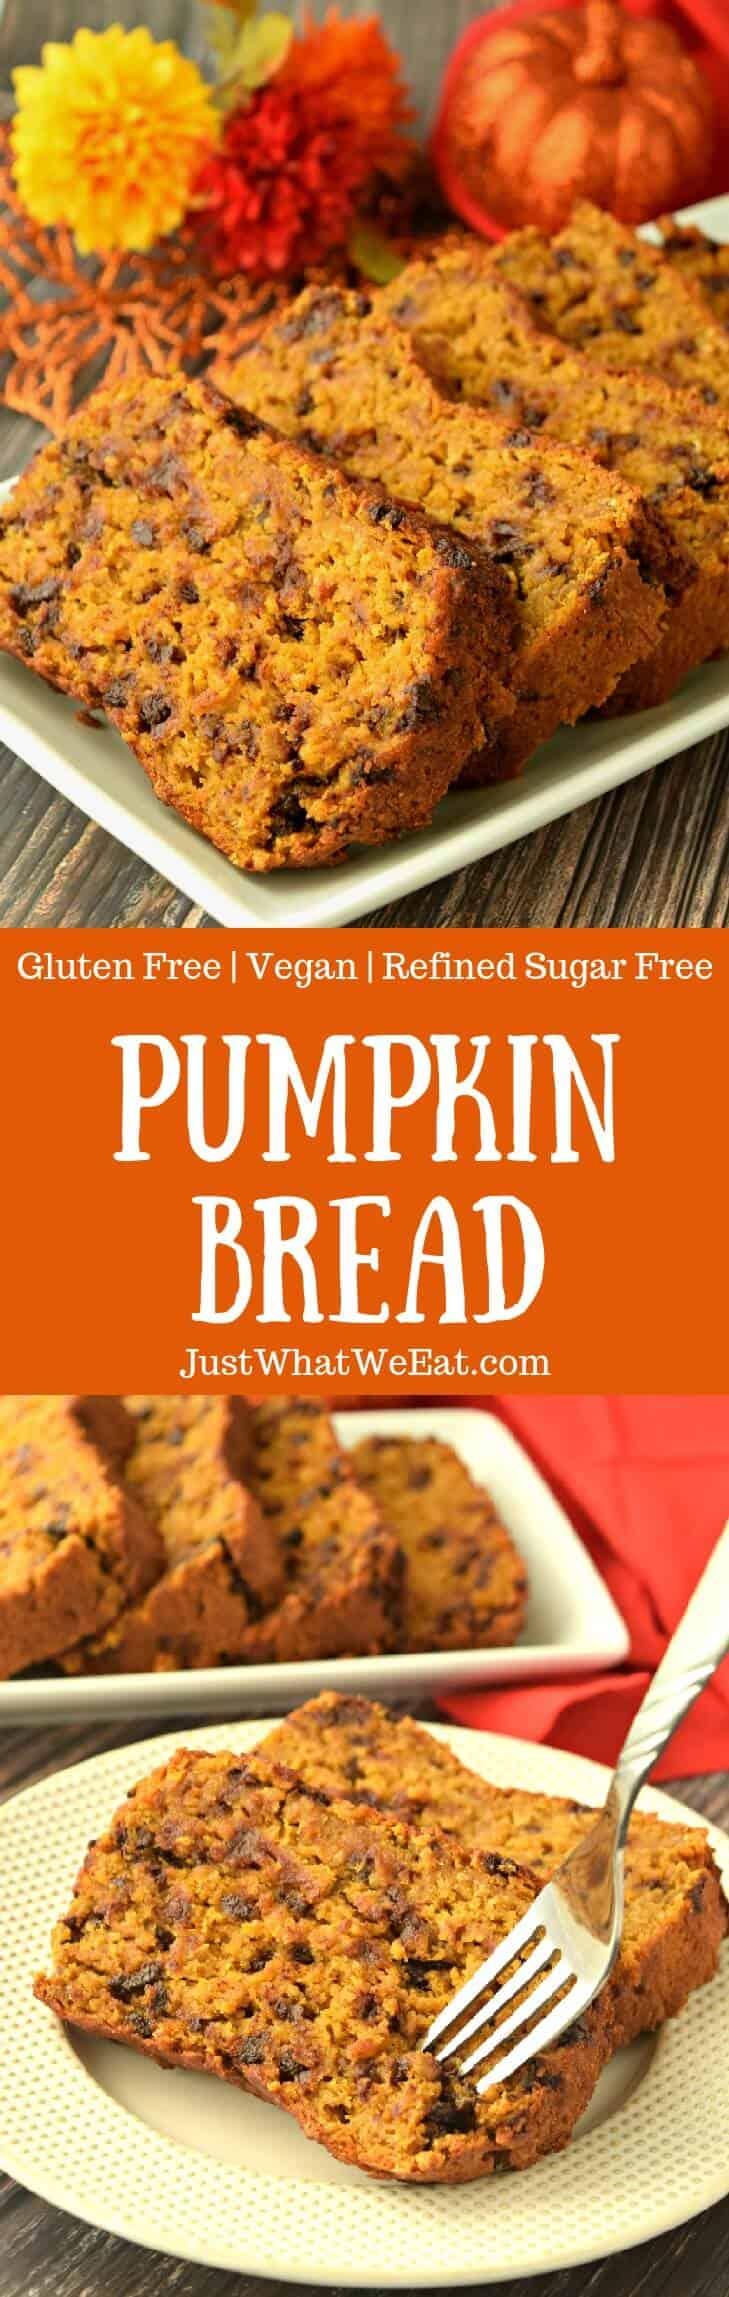 Pumpkin Bread - Gluten Free, Vegan, & Refined Sugar Free